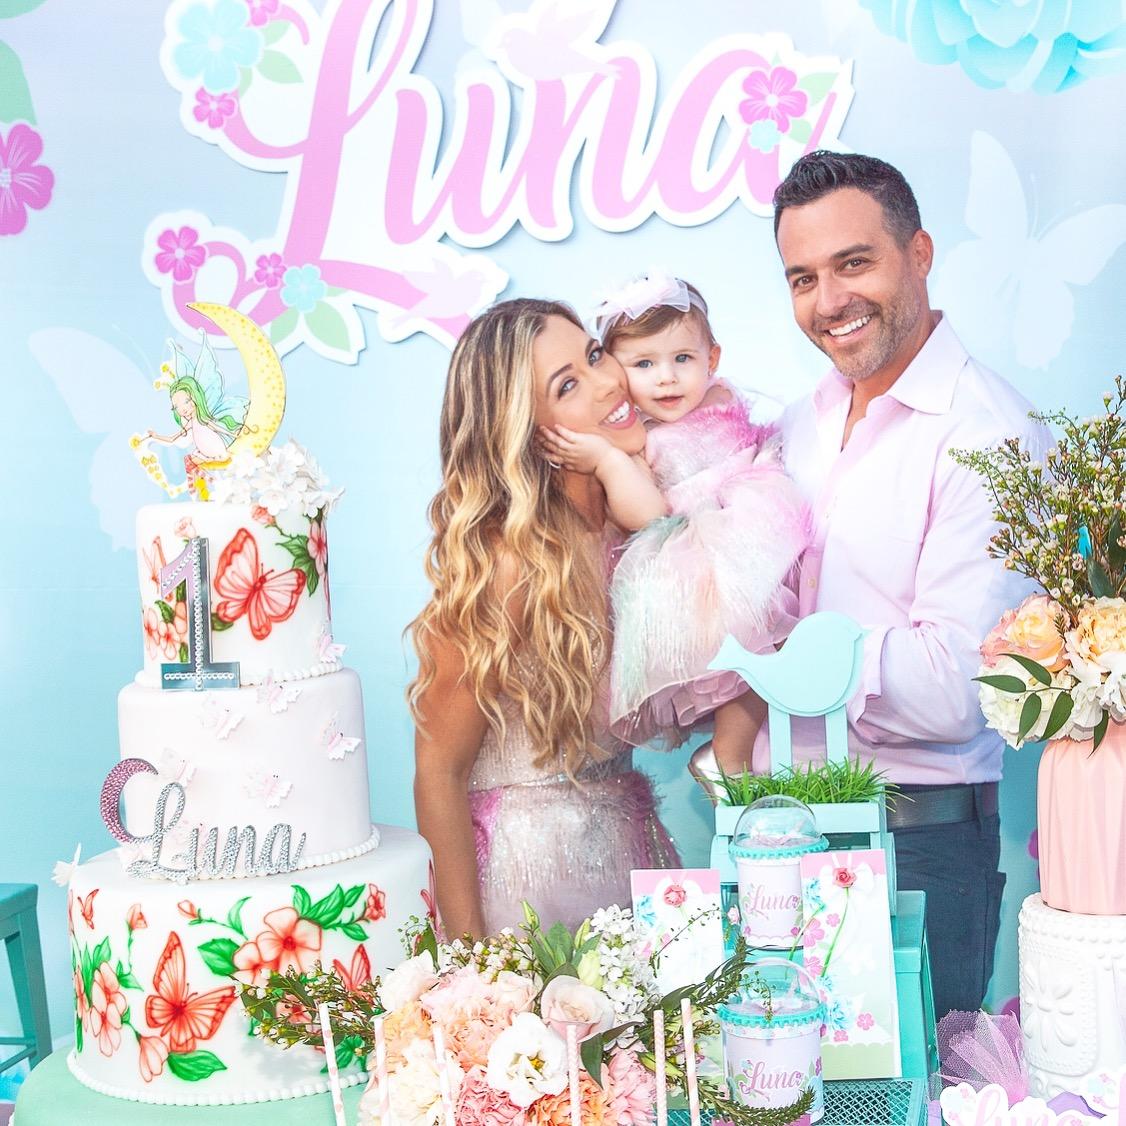 Ximena Duque y familia